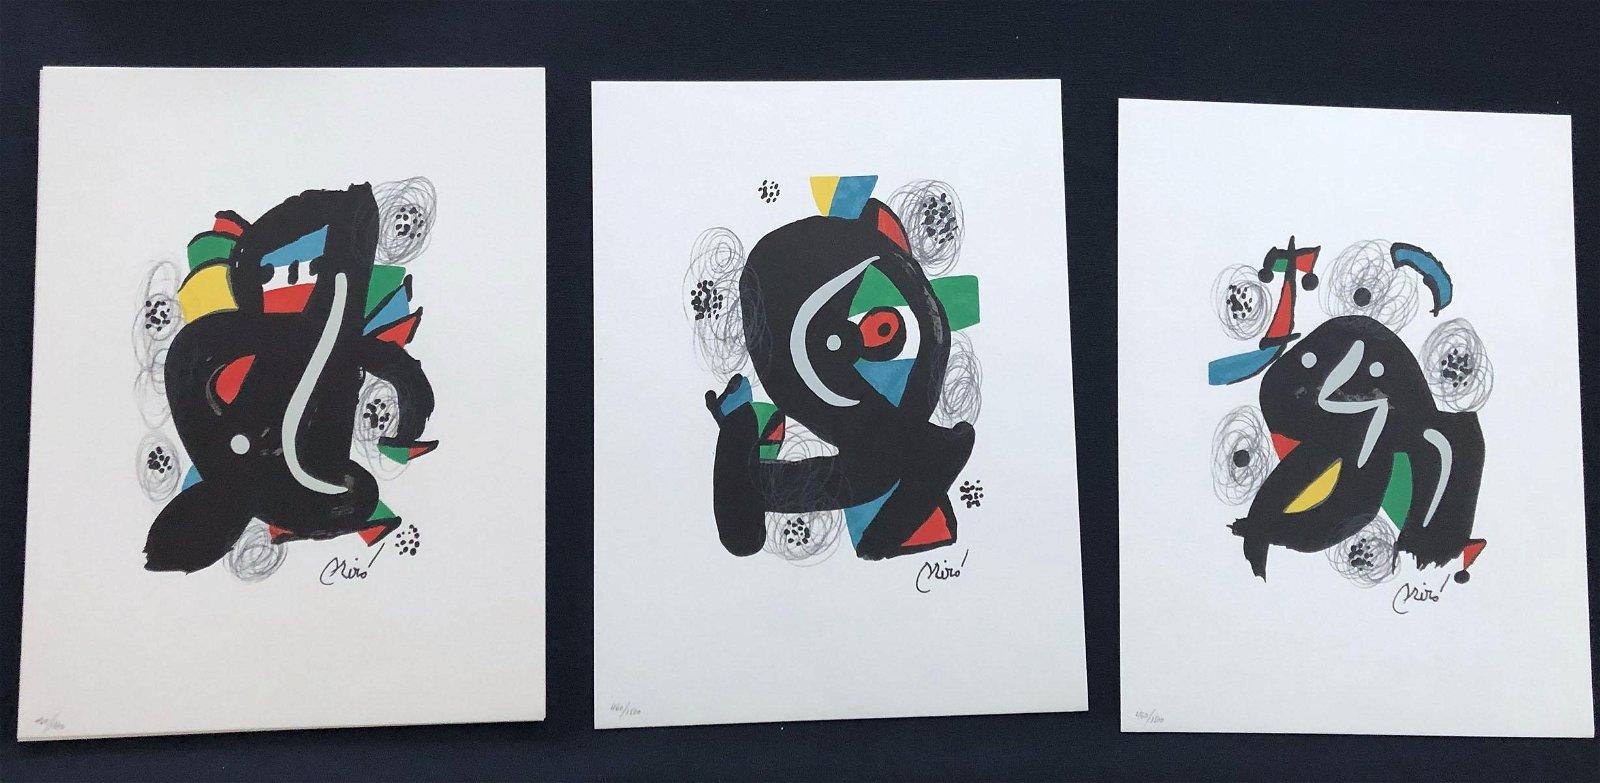 Miro La Melodie Acide portfolio with 14 lithographs